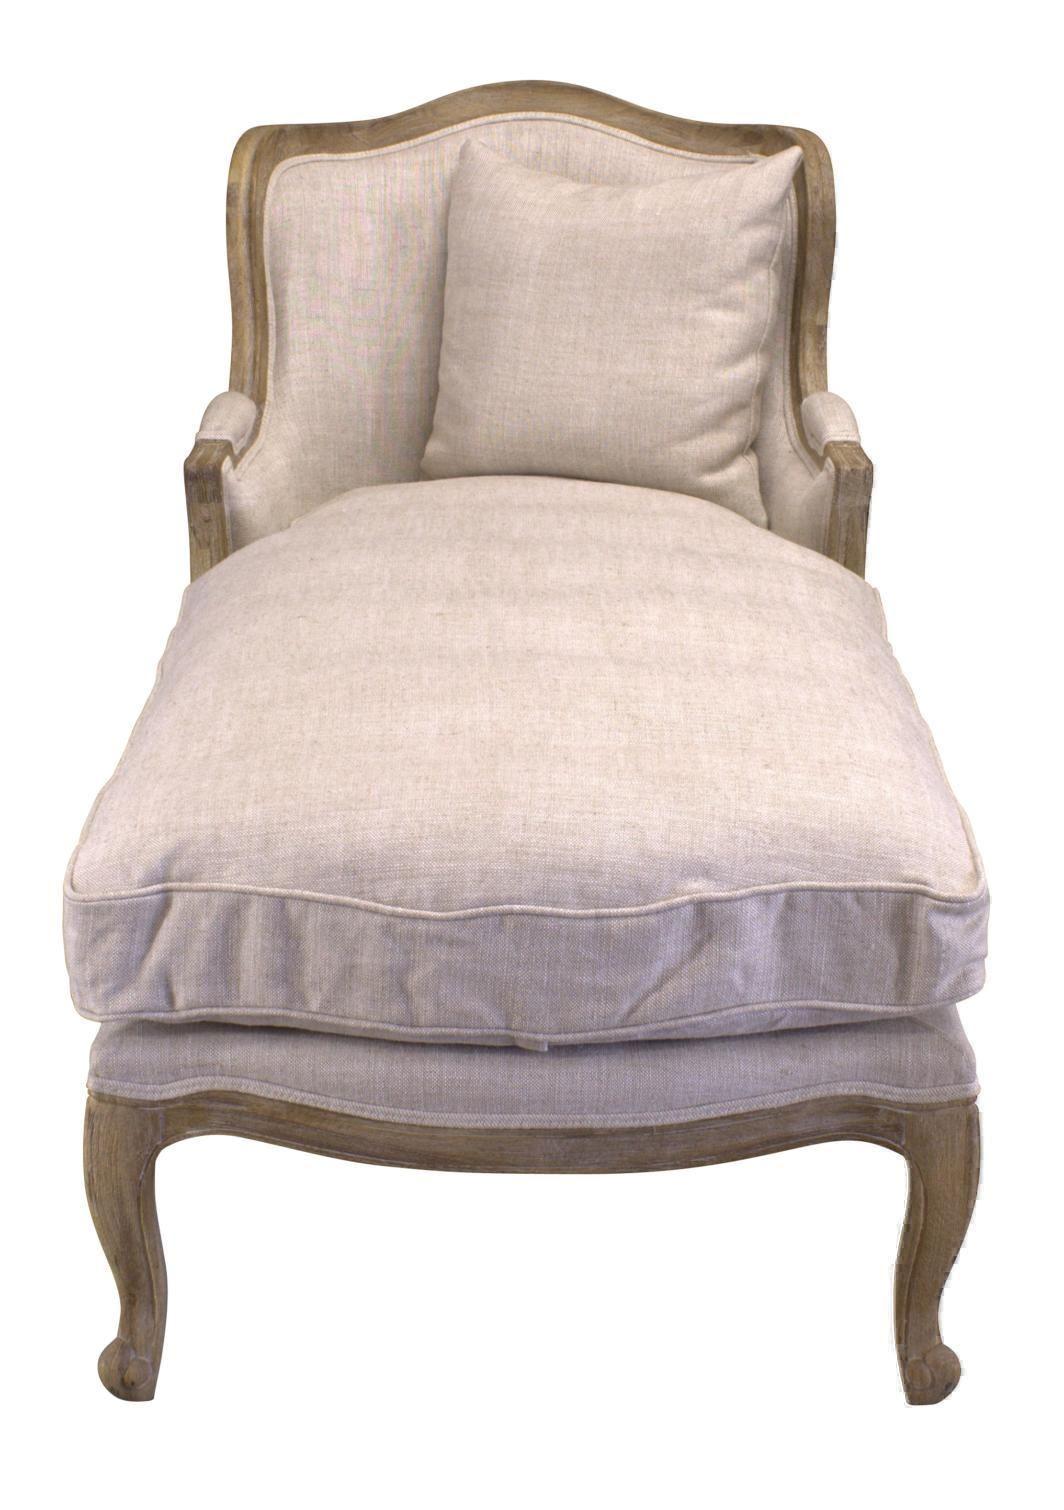 ce king louis chaiselong. Black Bedroom Furniture Sets. Home Design Ideas